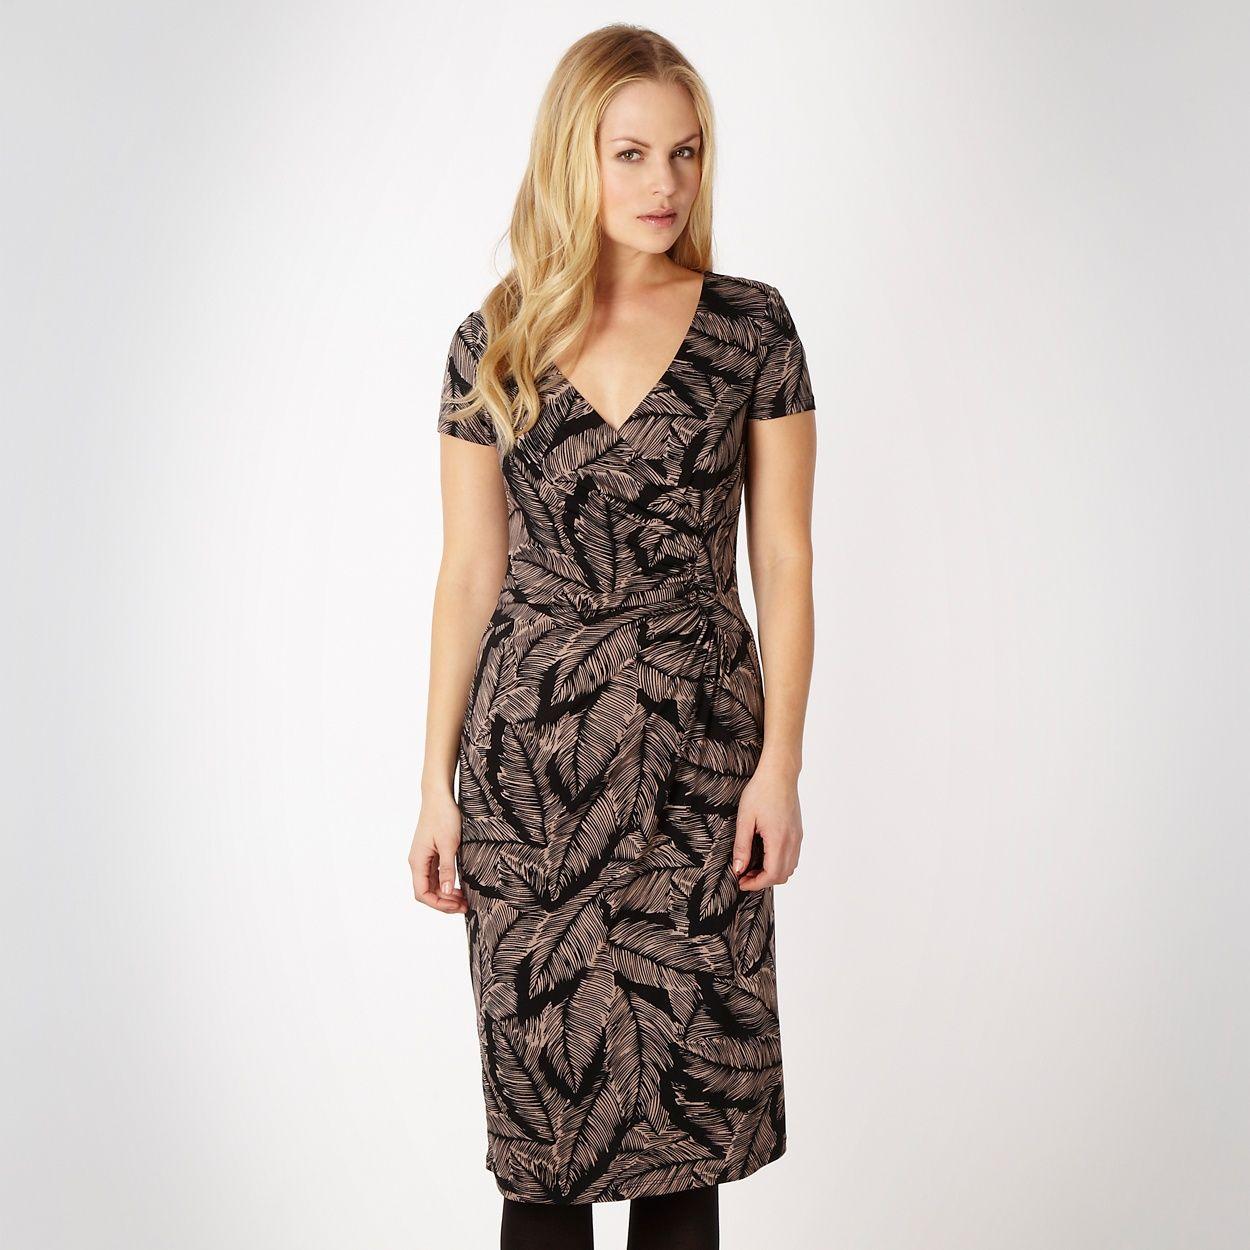 Betty Jackson Black Designer Feather Printed Wrap Dress At Debenhams